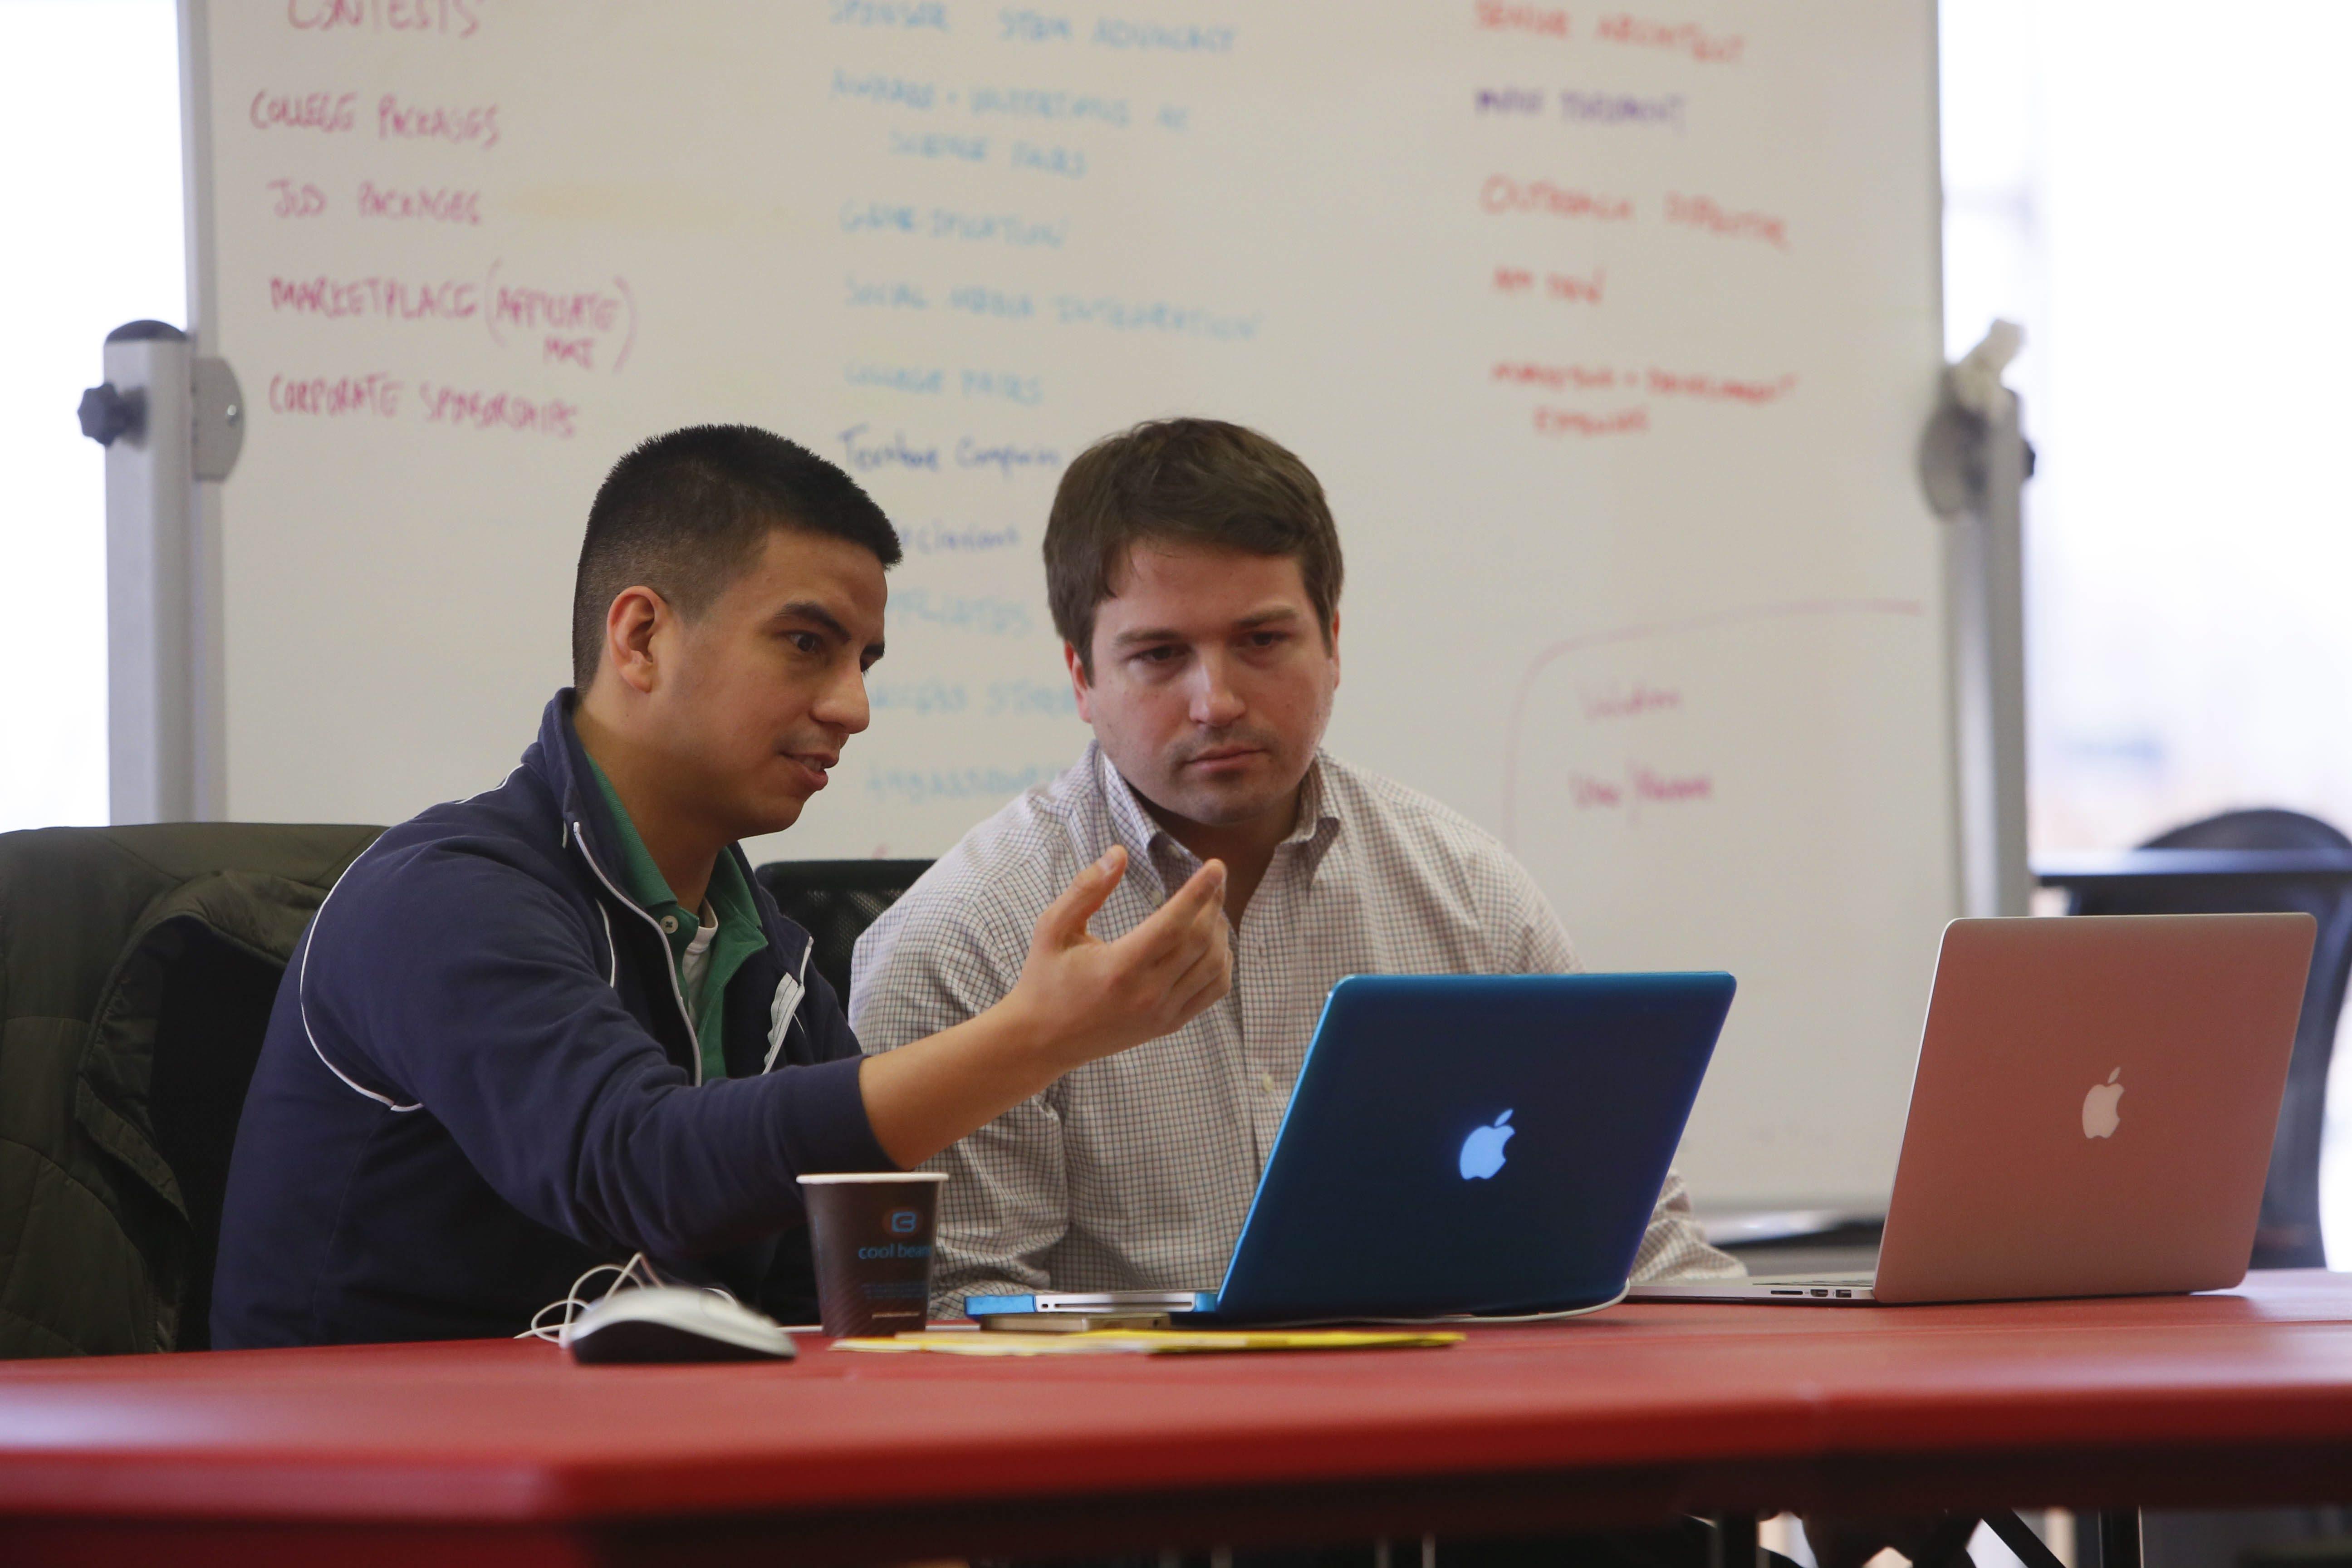 Oscar Pedroso, founder of GradFly, left, talks strategy with Dan Magnuszewski, managing director of Z80 Incubator Labs.